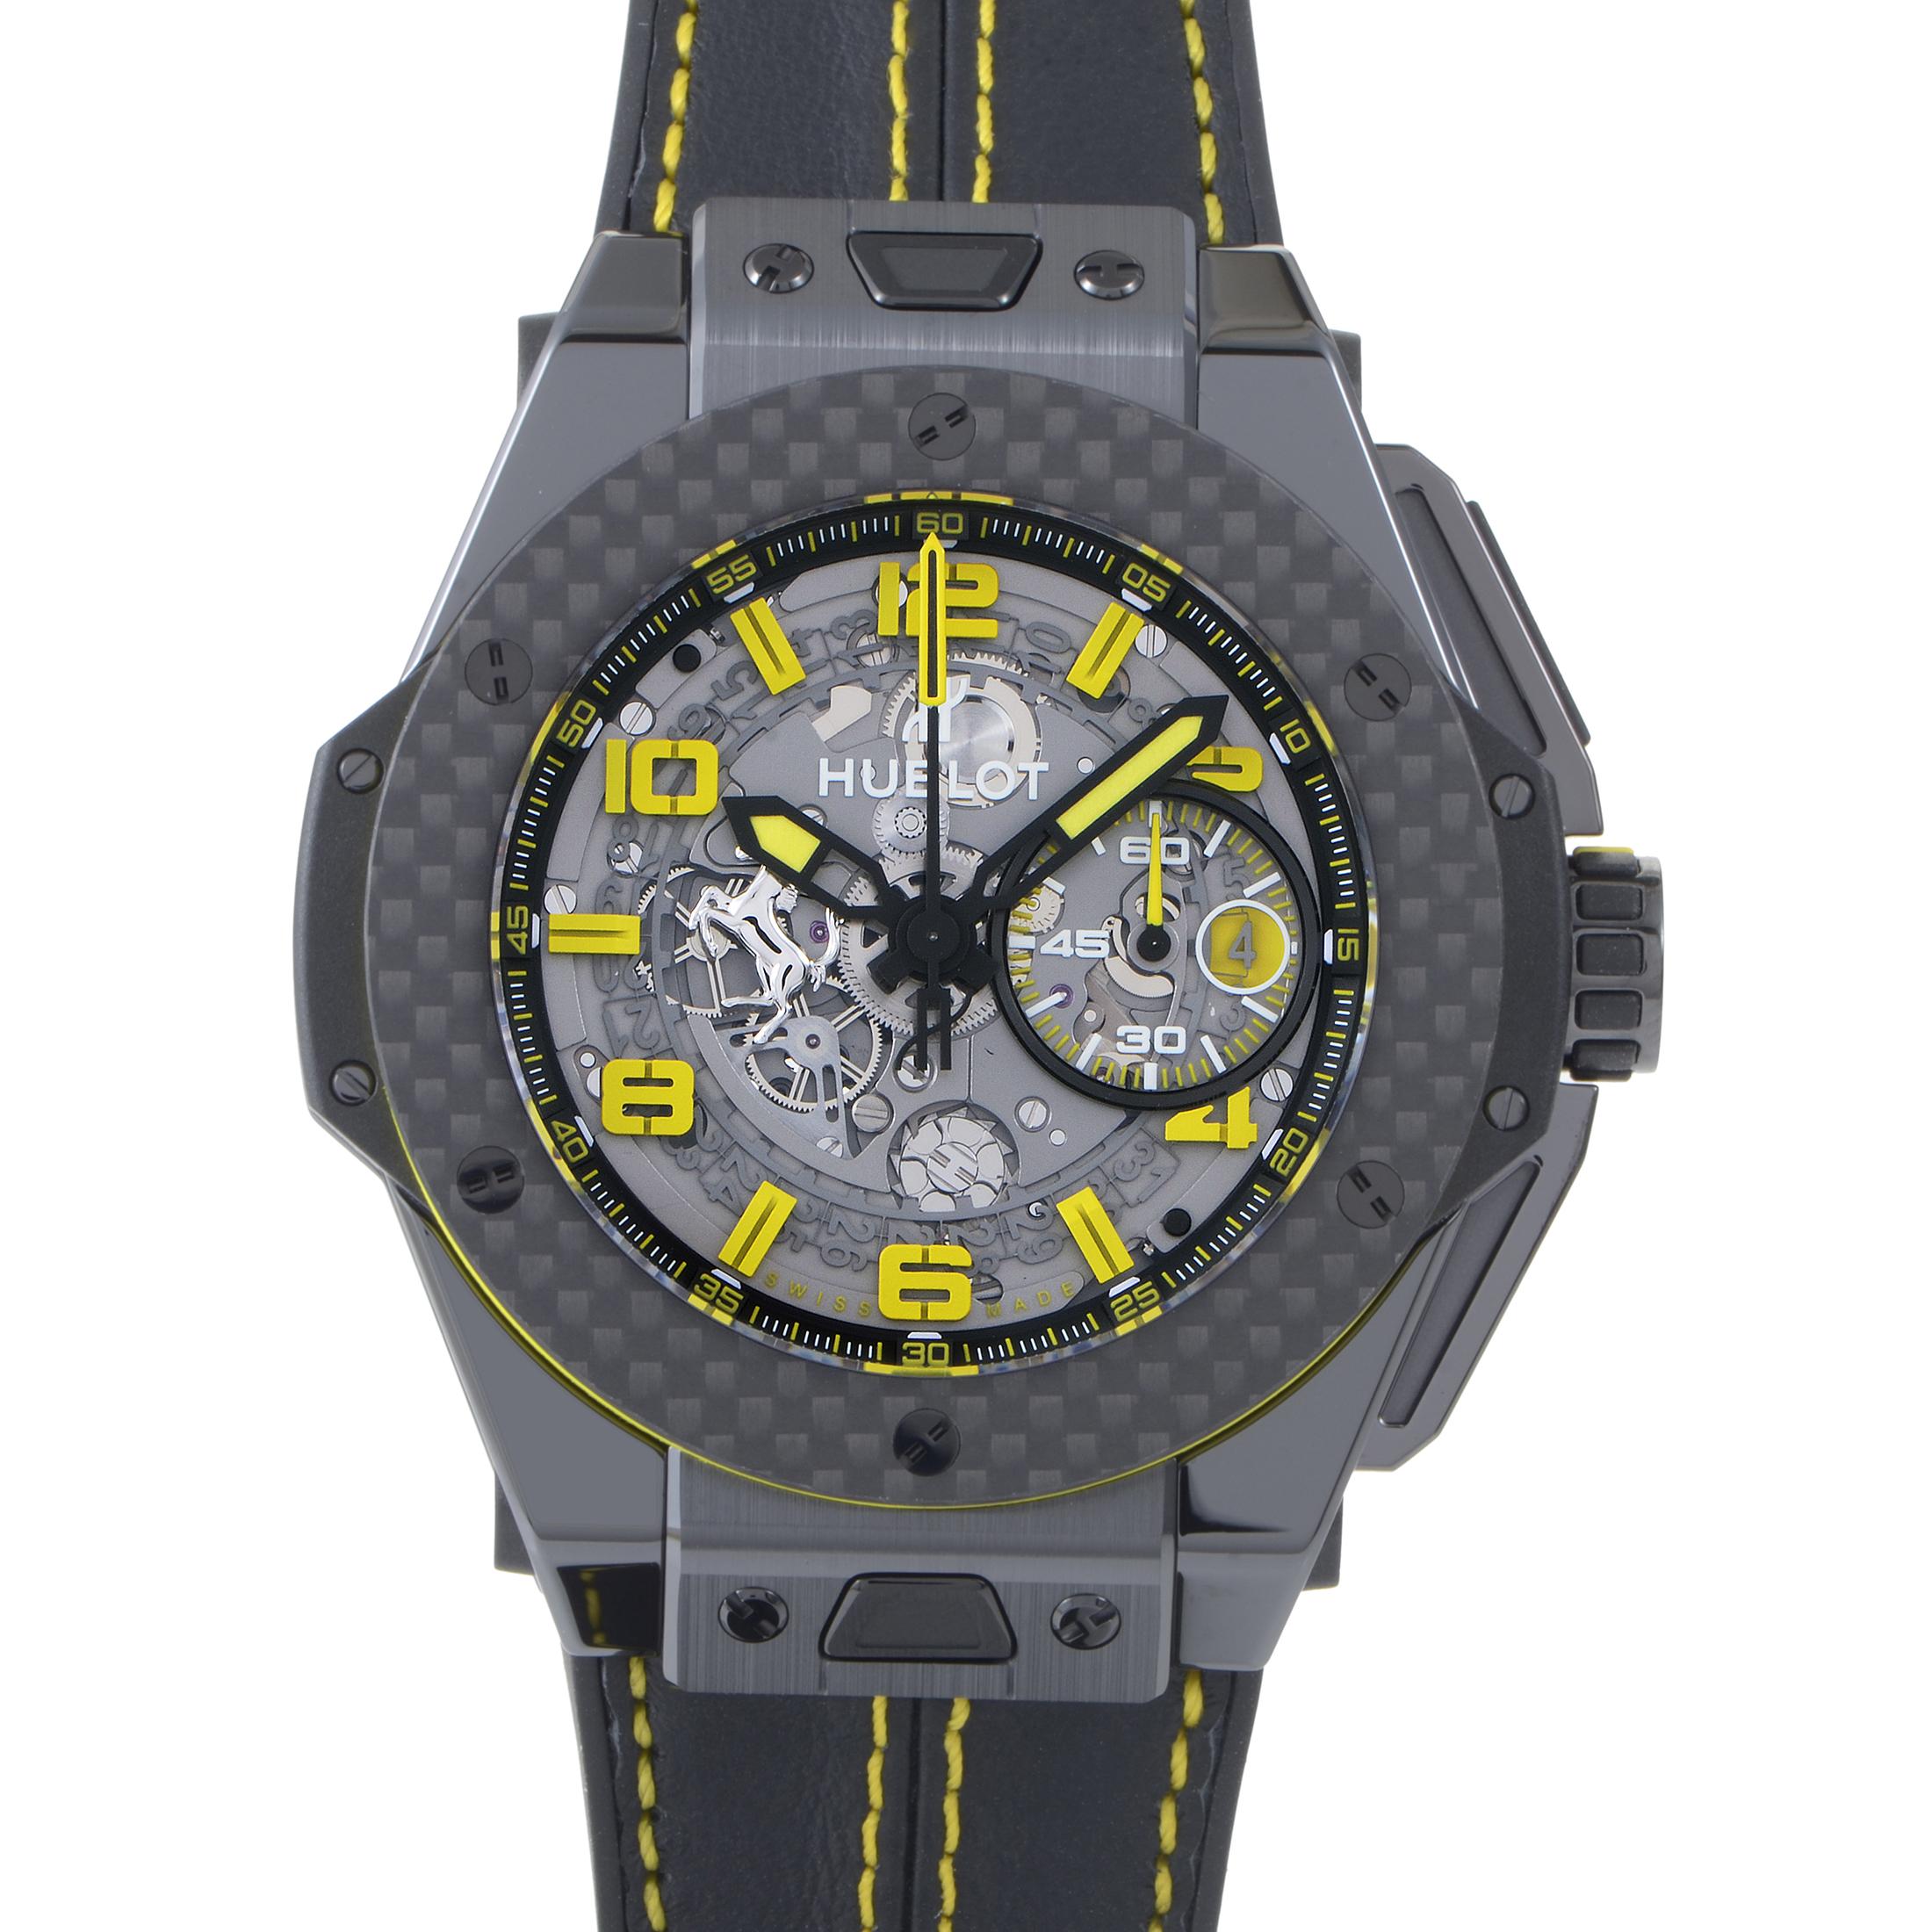 Big Bang Ferrari Ceramic Carbon Mens Chronograph Watch 401.CQ.0129.VR